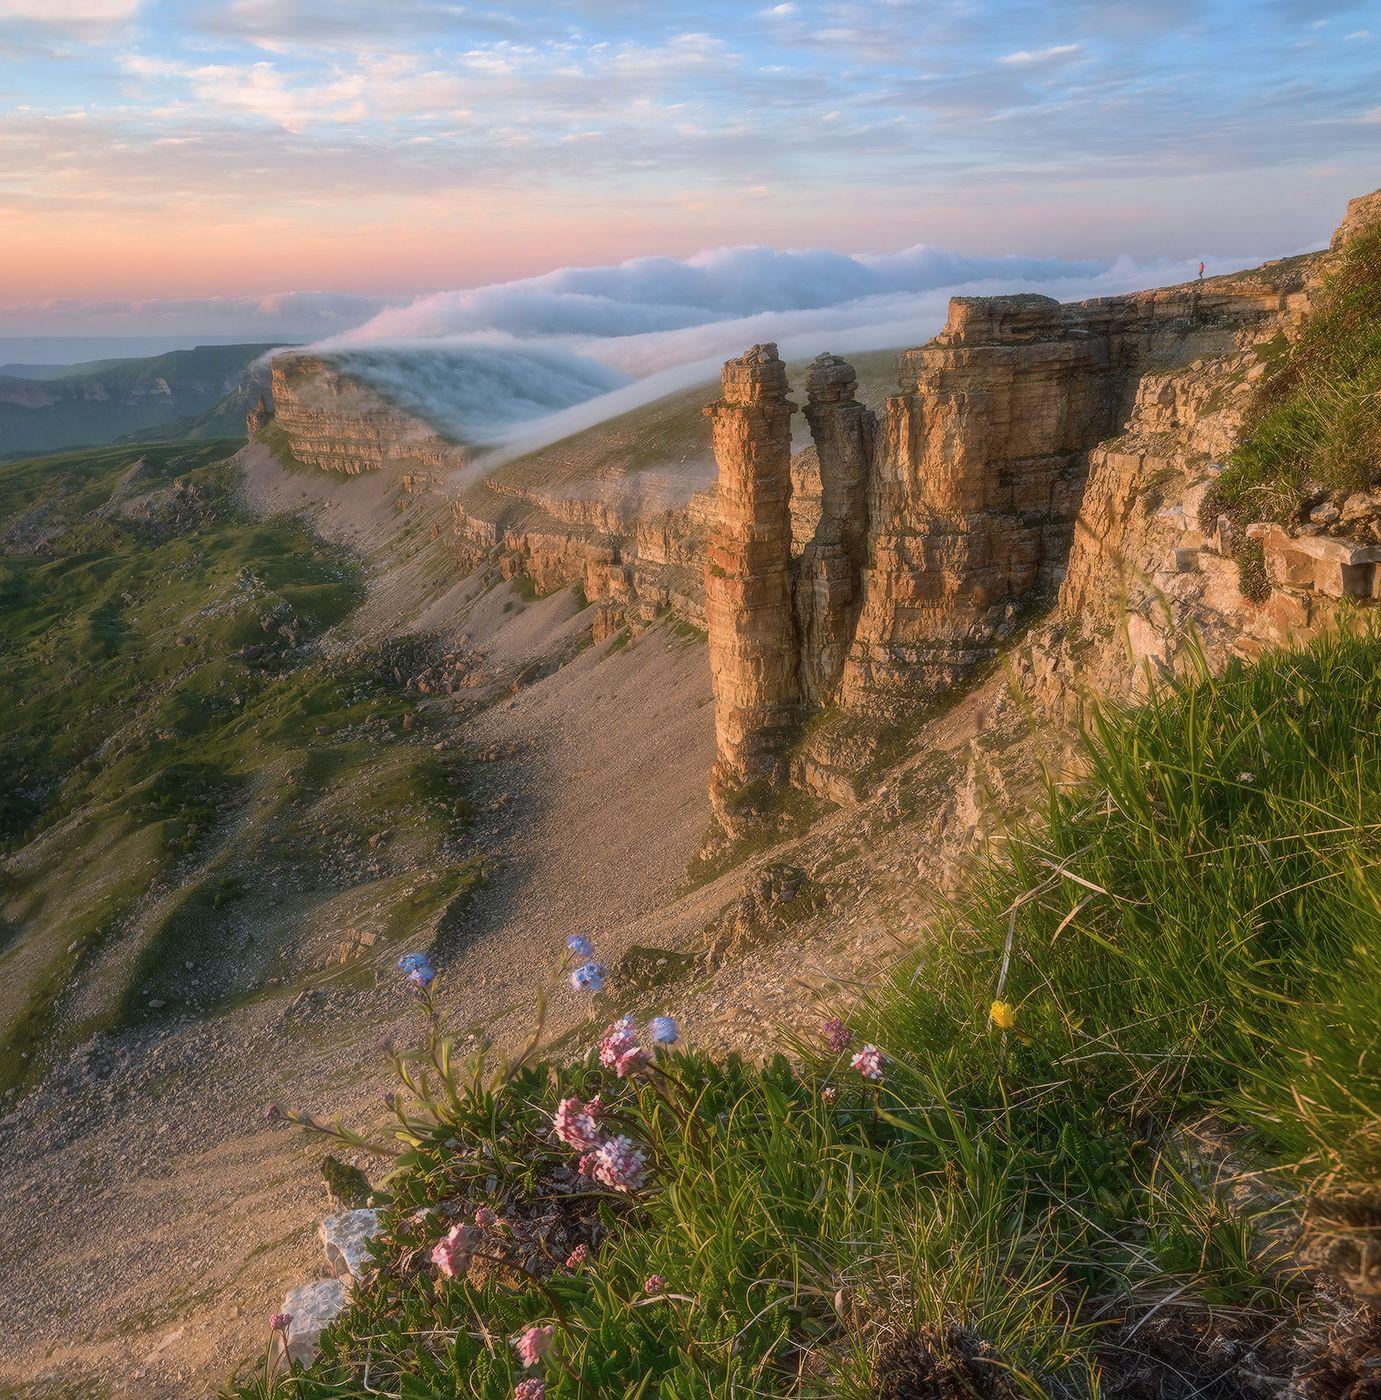 Бермамыт. Два монаха. Северный кавказ карачаево-черкесия бермамыт два монаха июнь закат